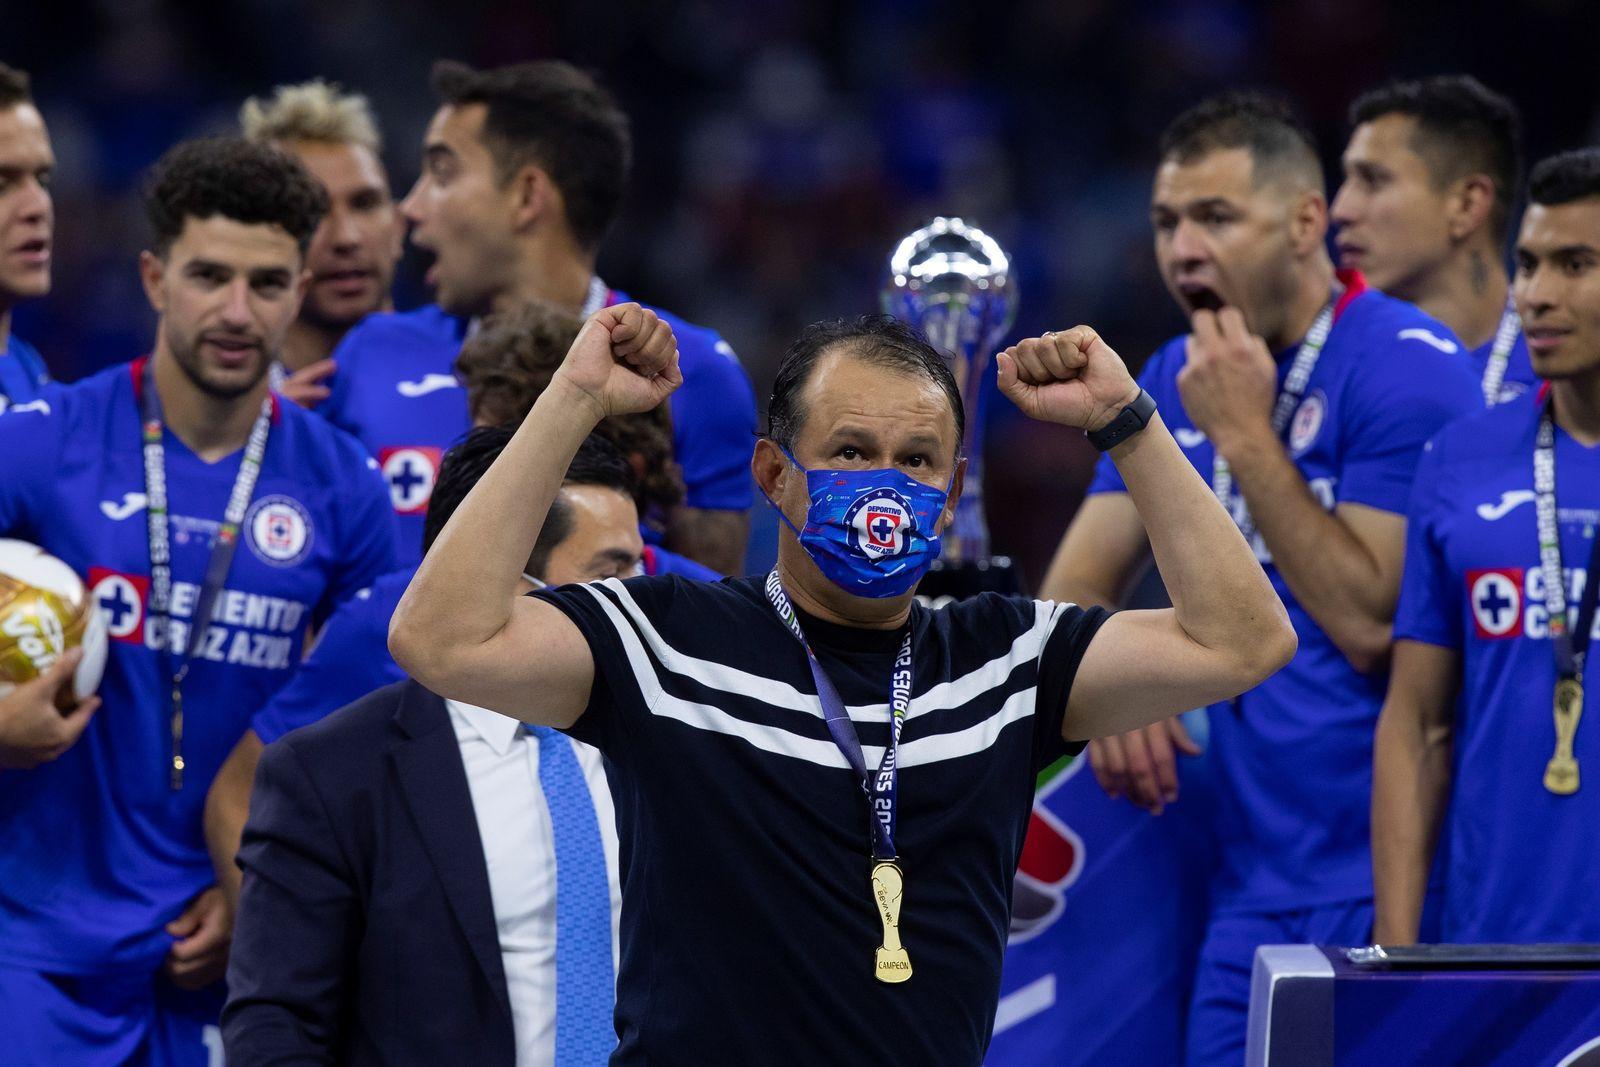 Cruz Azul vs Santos, La Final